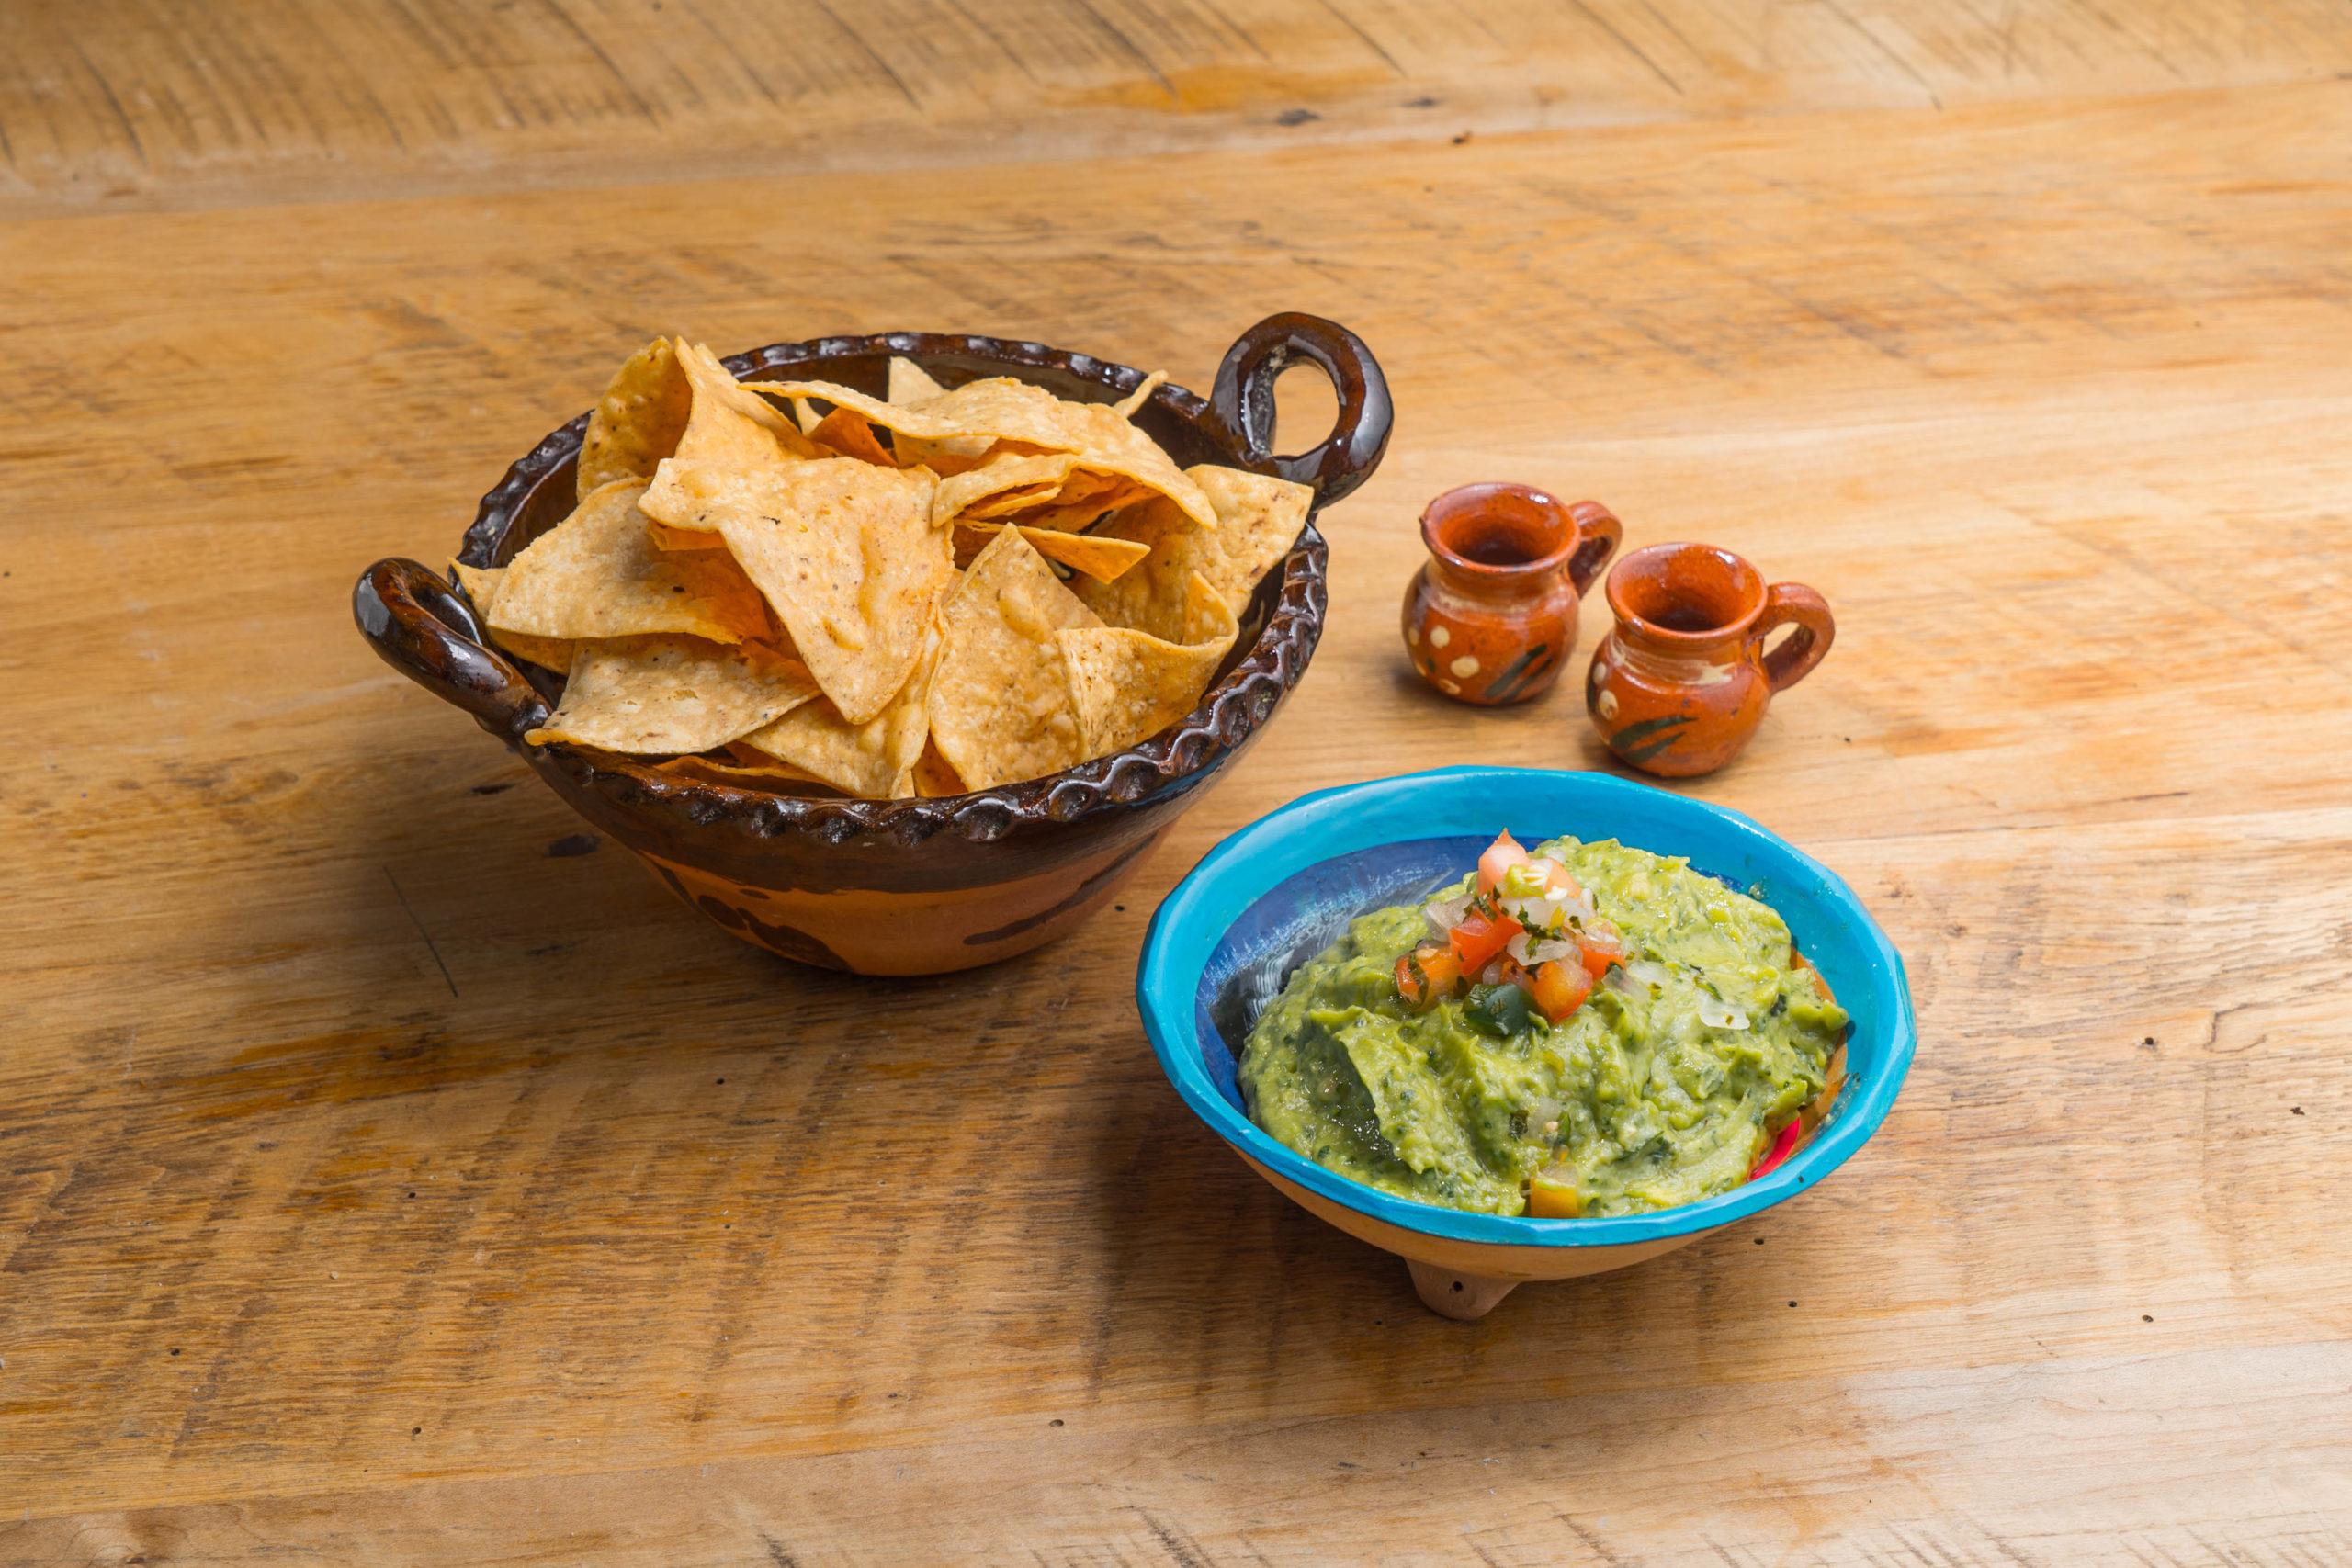 El Toro Rojo food truck Chips and Guac